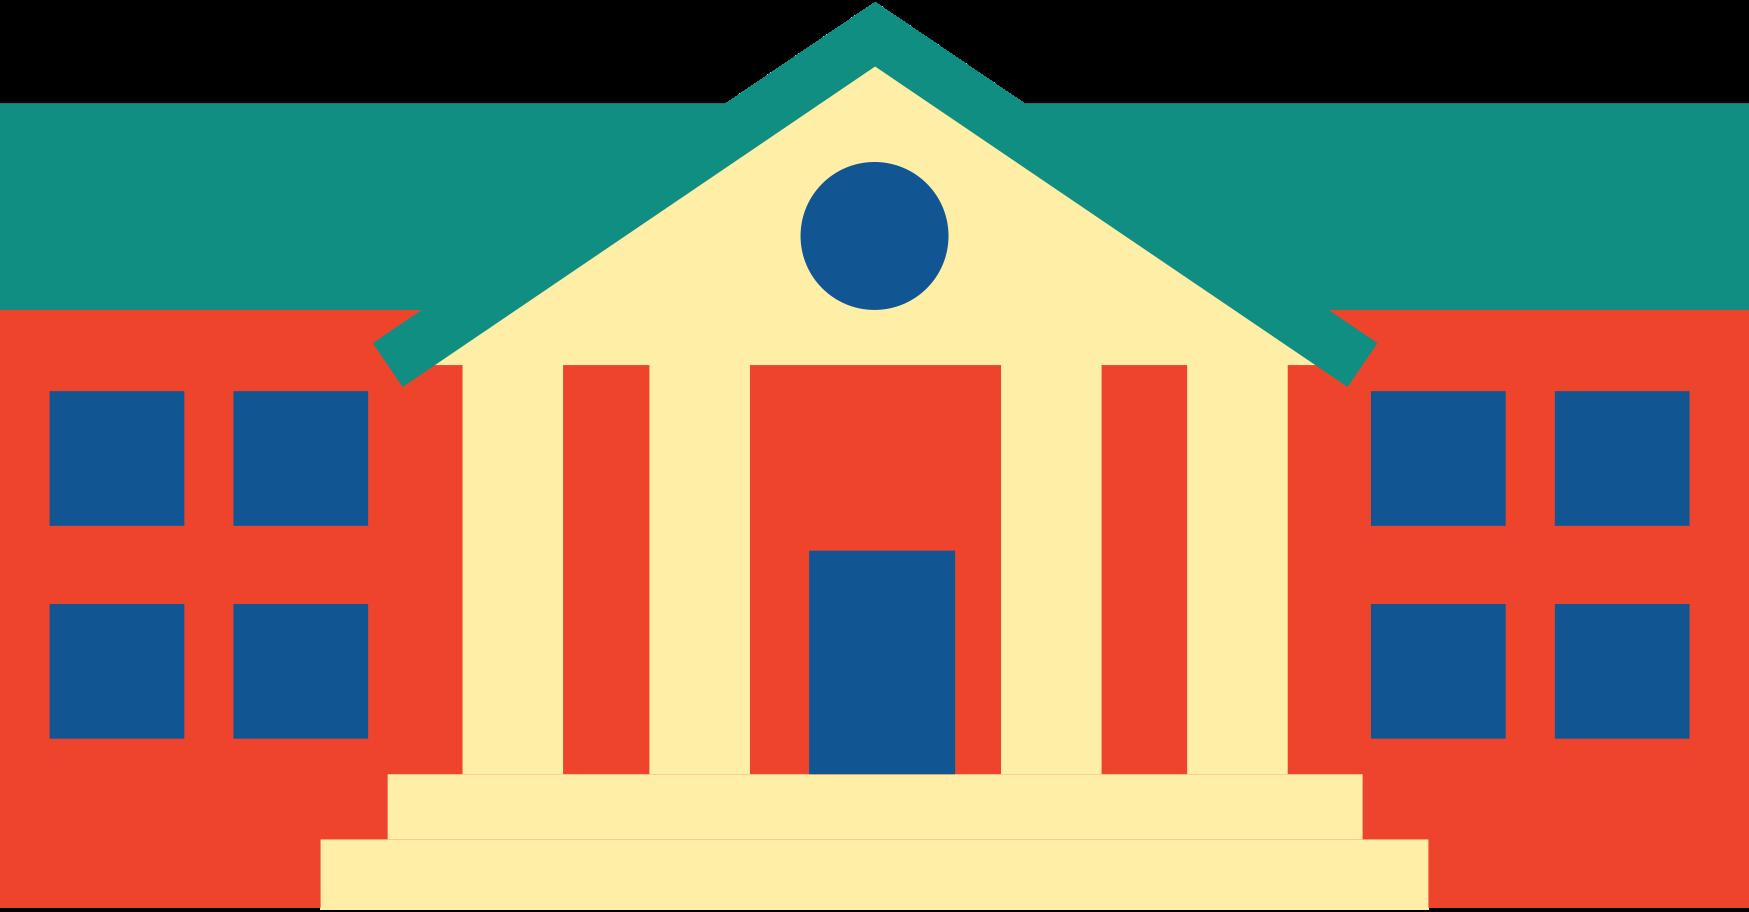 university building Clipart illustration in PNG, SVG